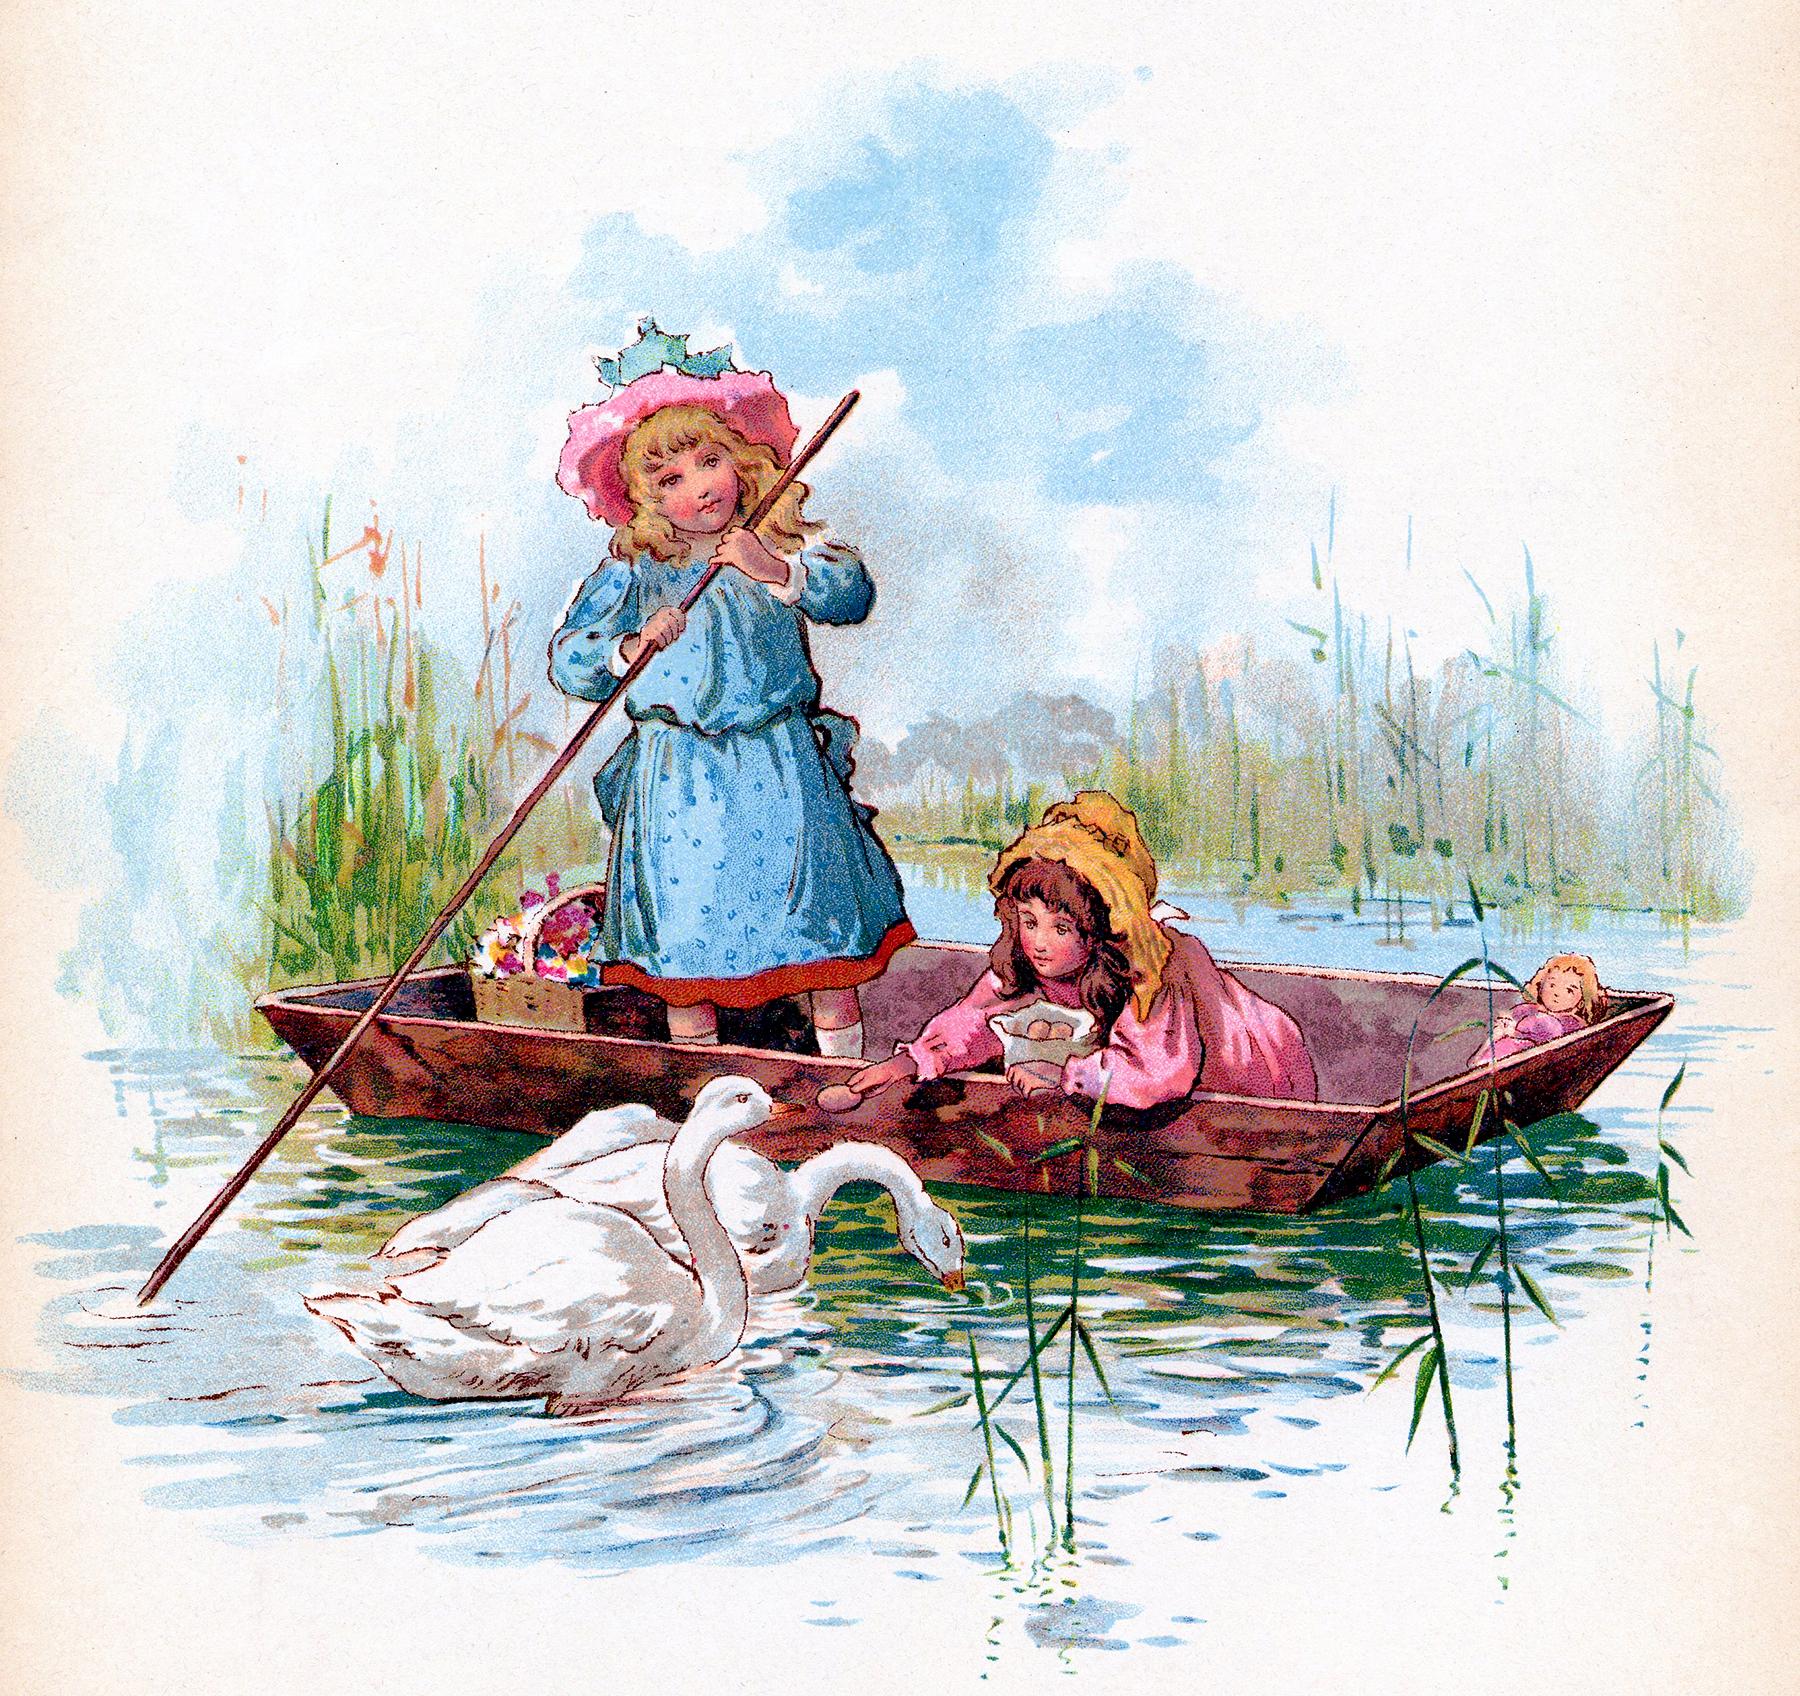 Children Feeding Swans Image